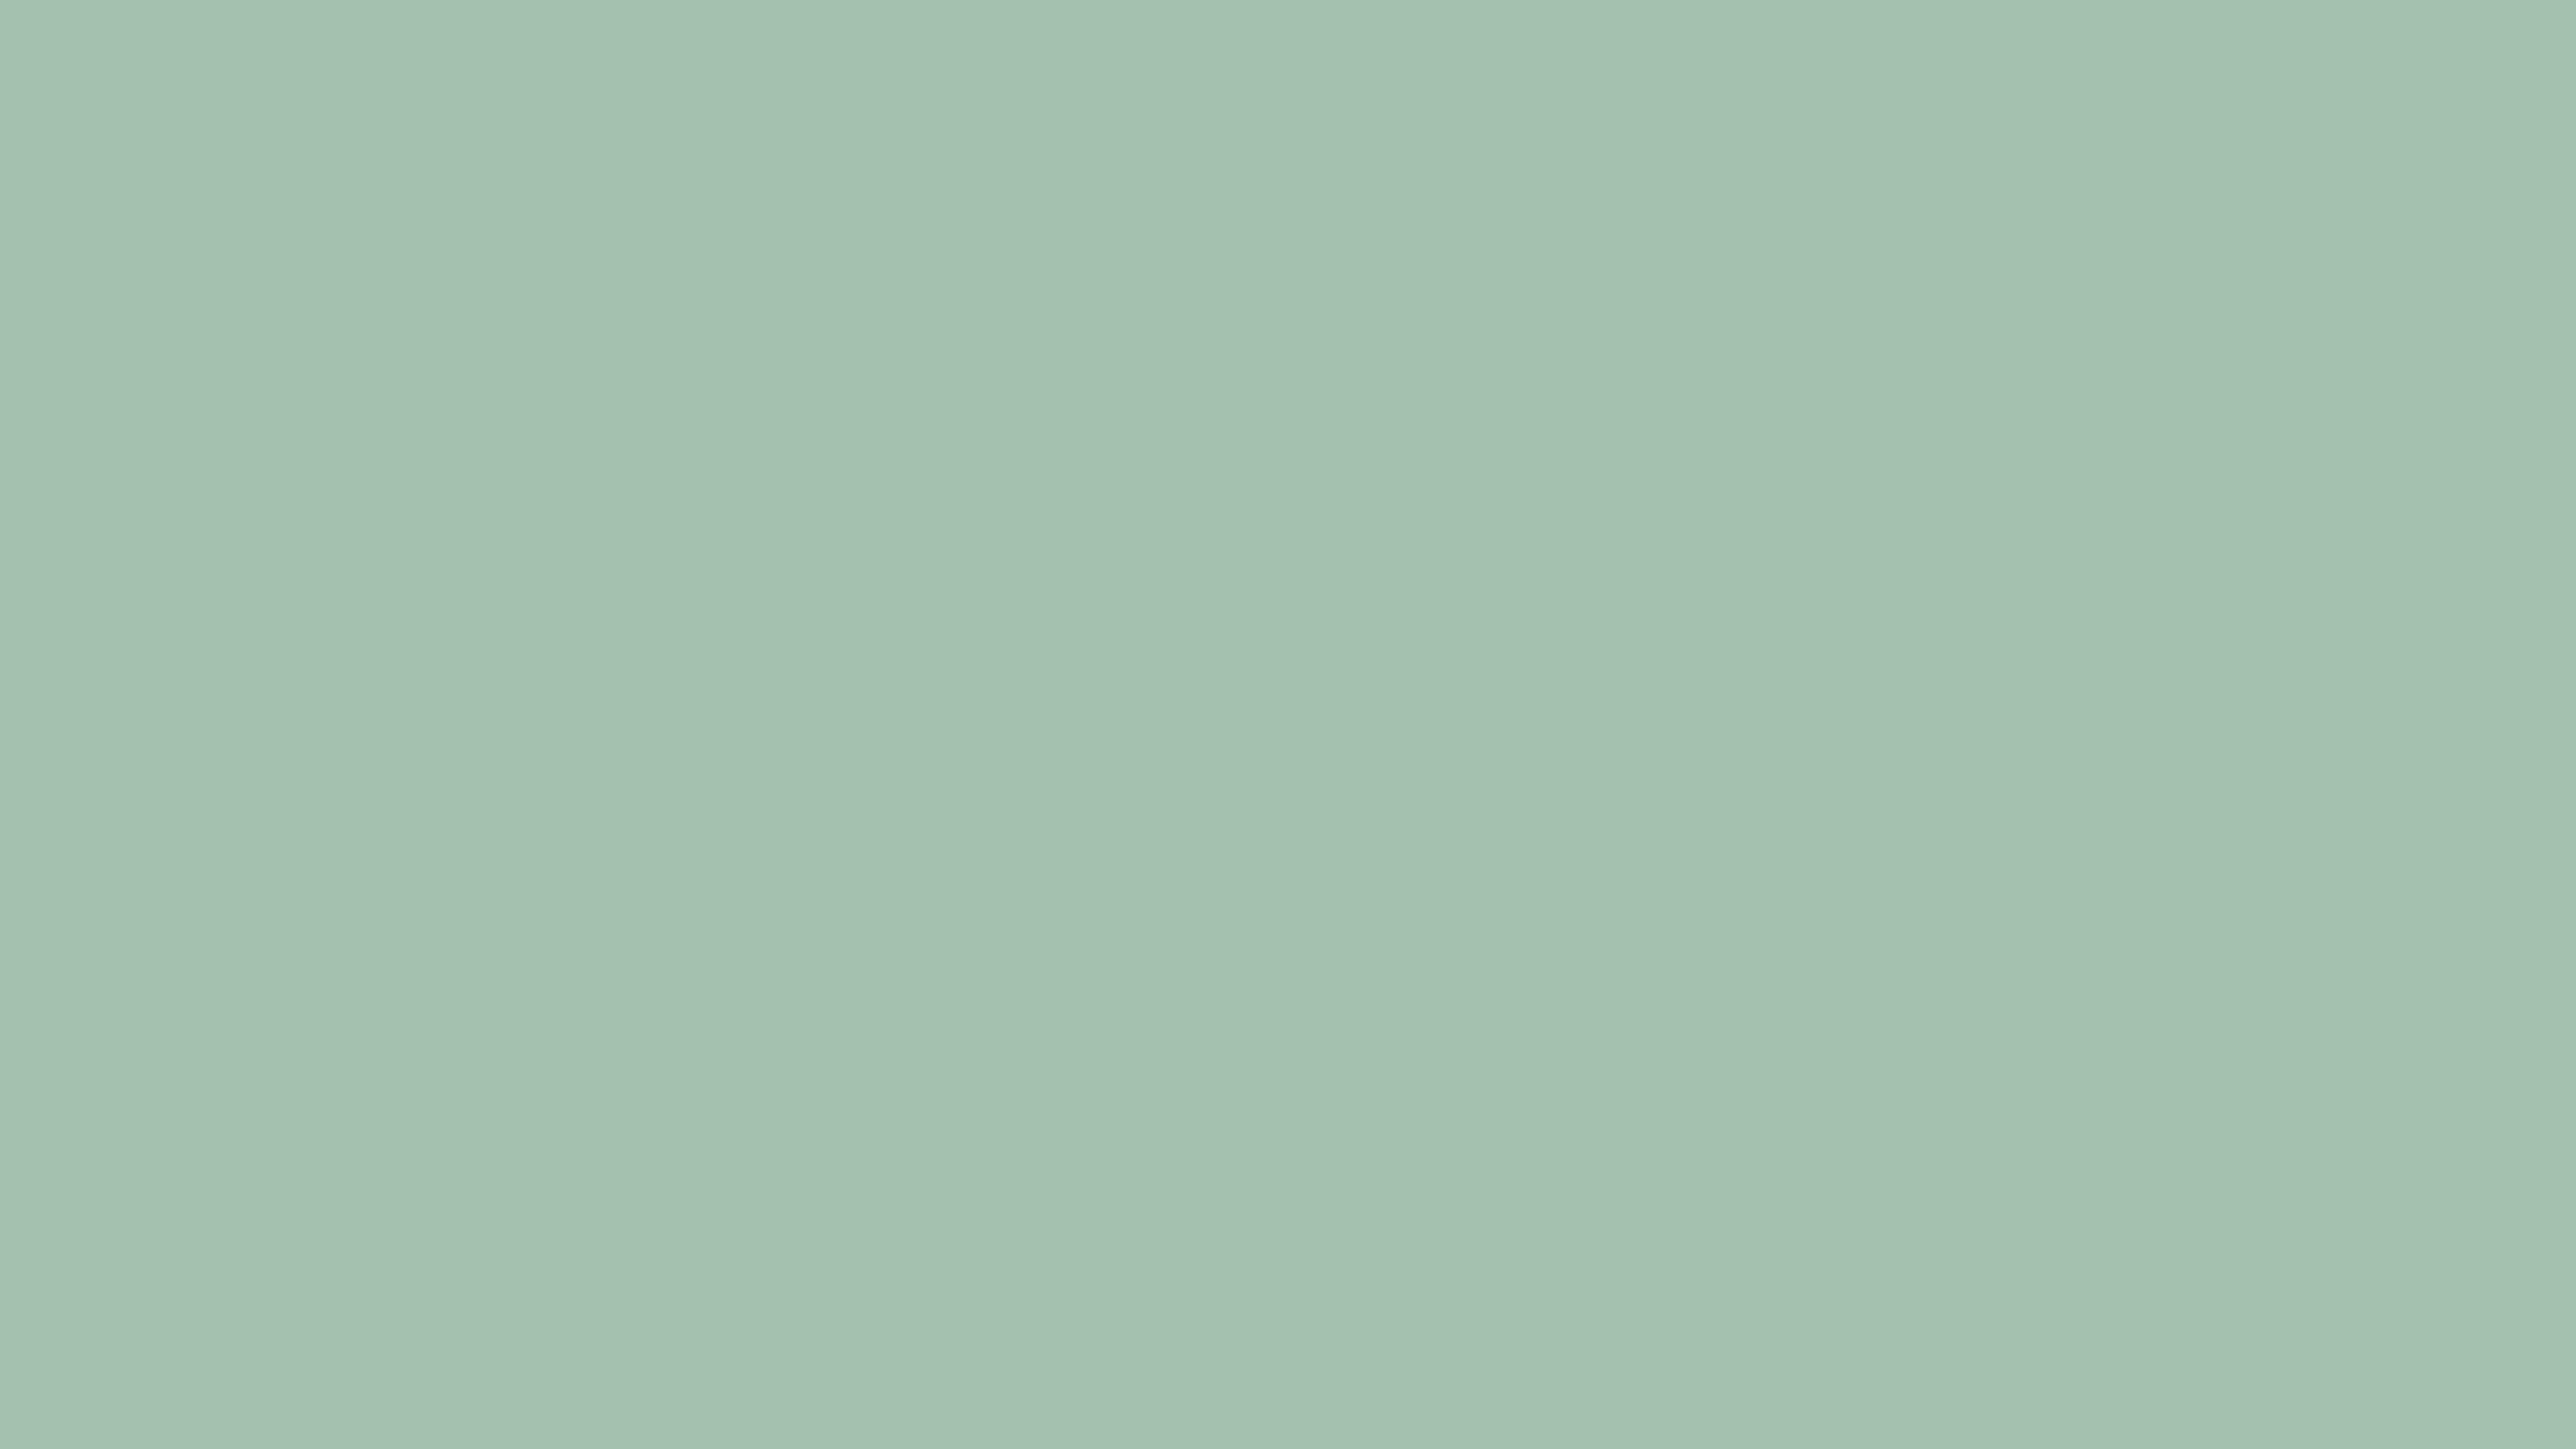 7680x4320 Cambridge Blue Solid Color Background